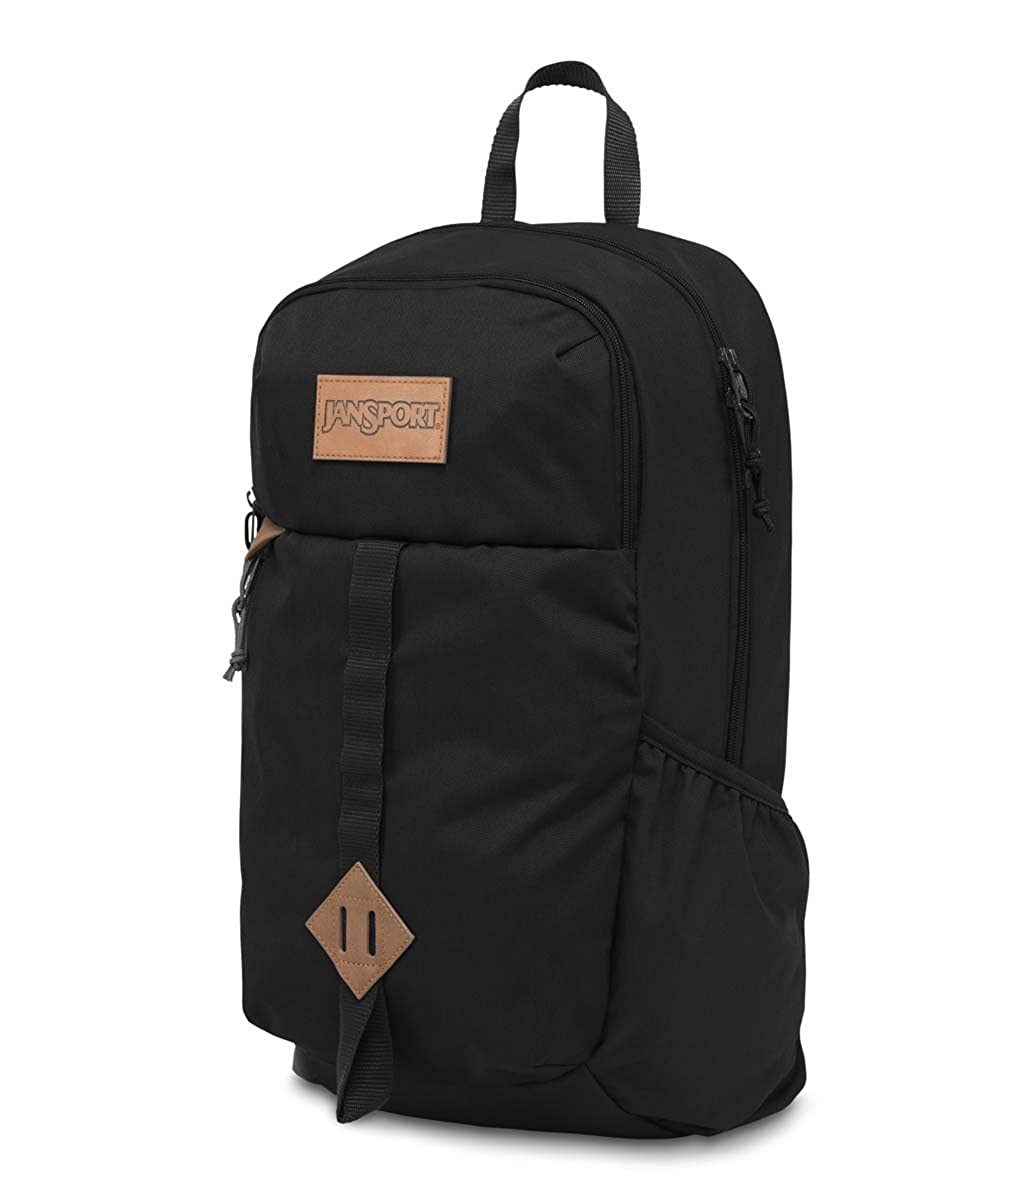 b3b515d706 Jansport hawk ridge backpack black computers accessories jpg 1032x1200  Philippines hawk backpack black